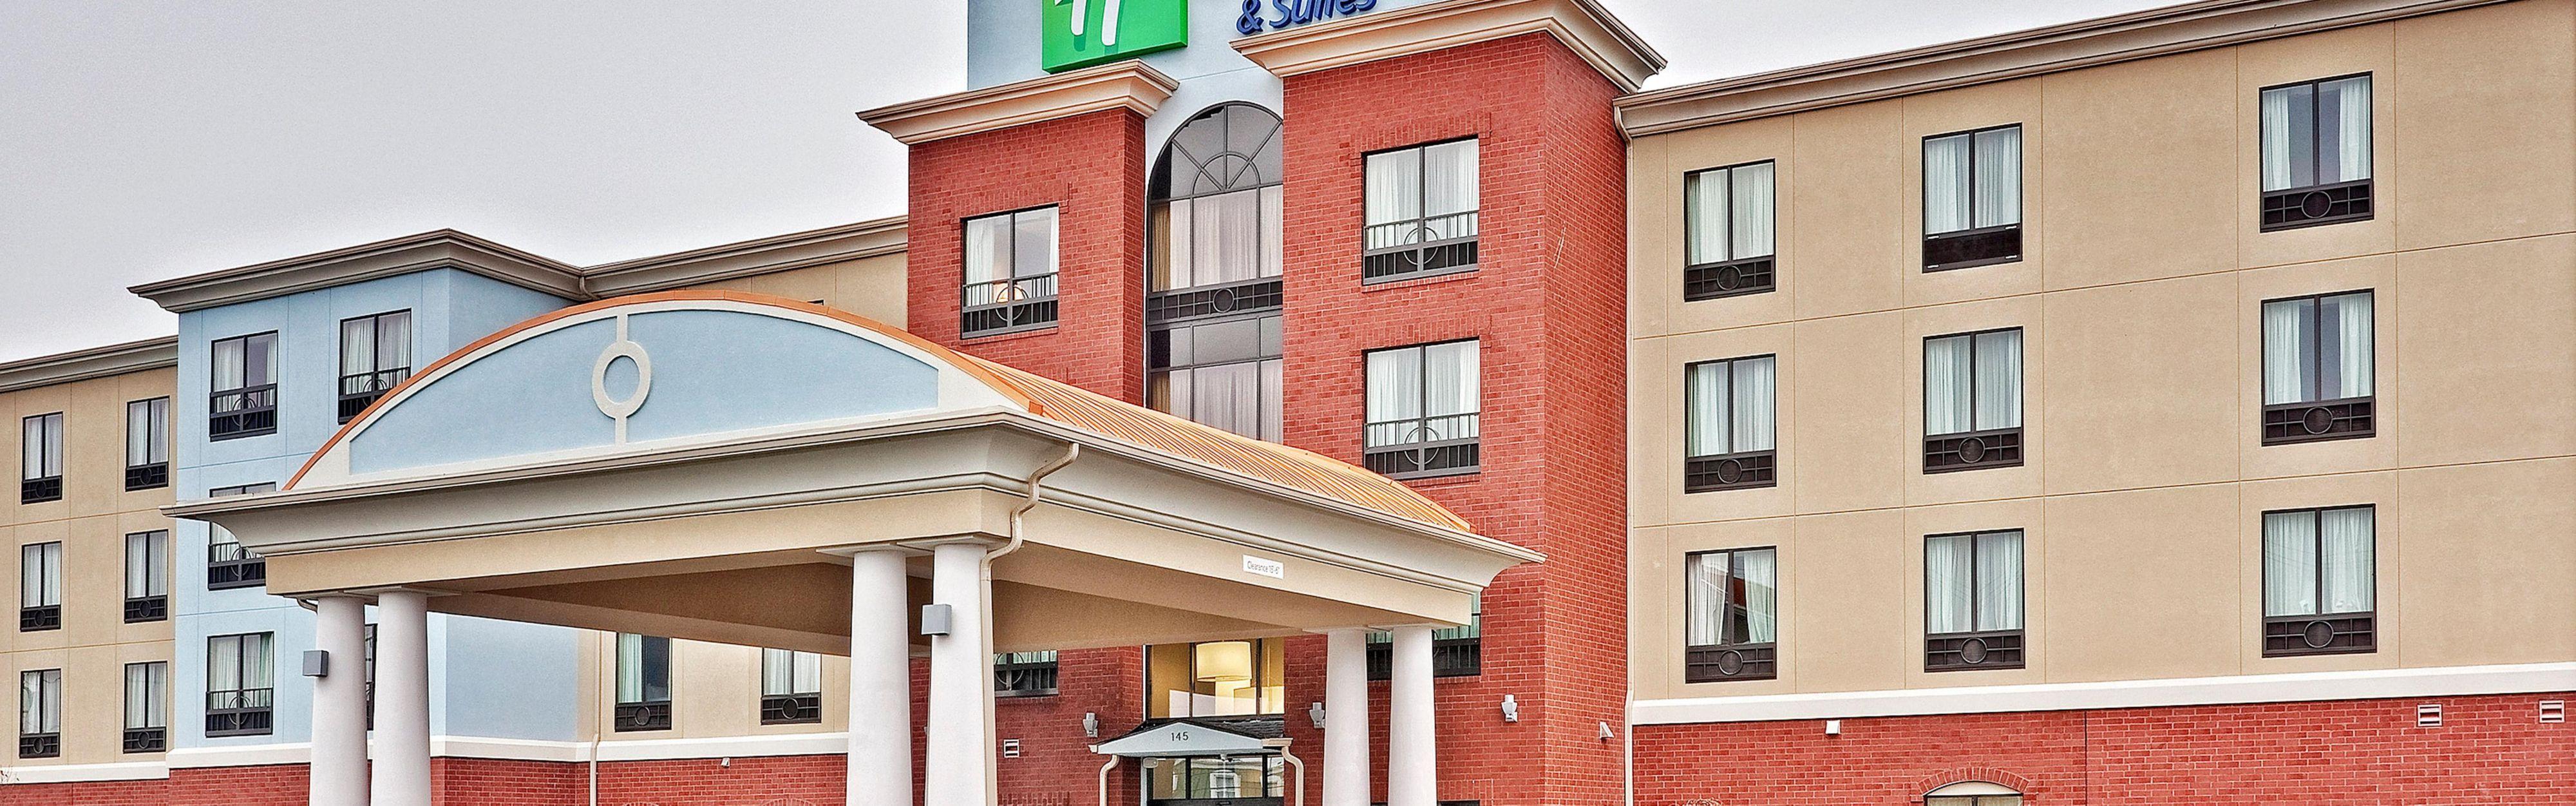 Holiday Inn Express & Suites New Philadelphia image 0